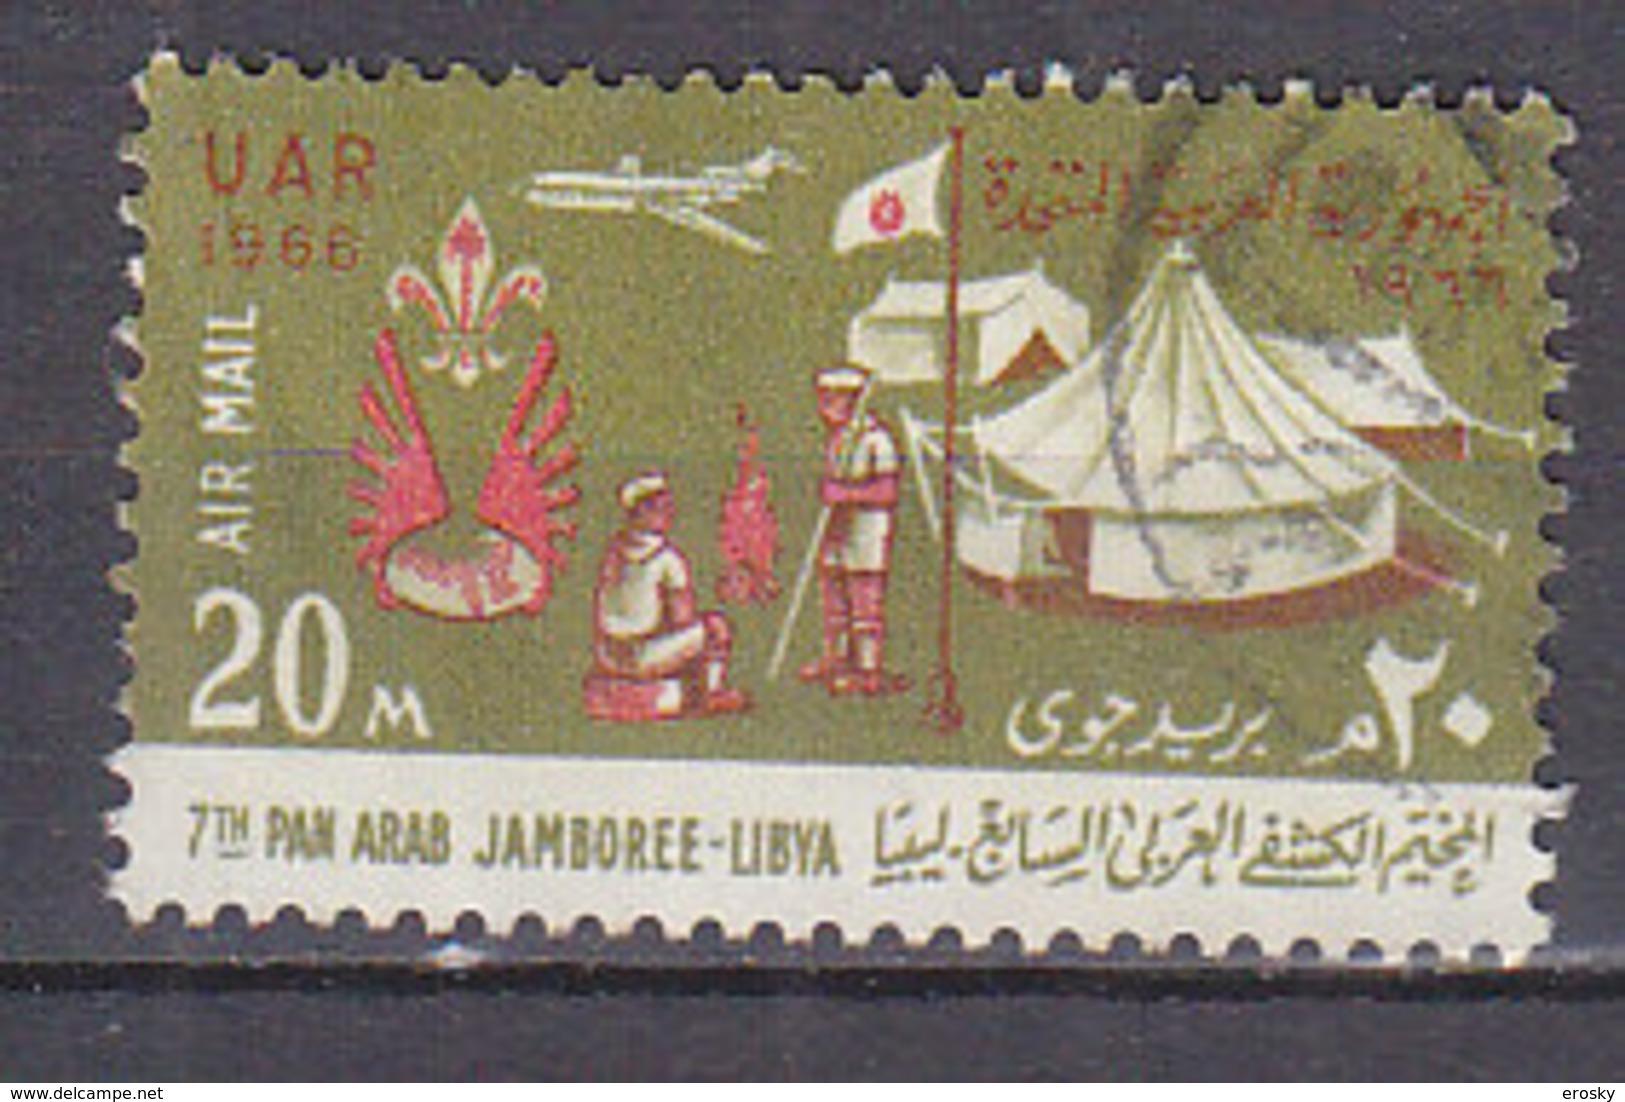 A0796 - EGYPTE EGYPT AERIENNE Yv N°101 - Poste Aérienne